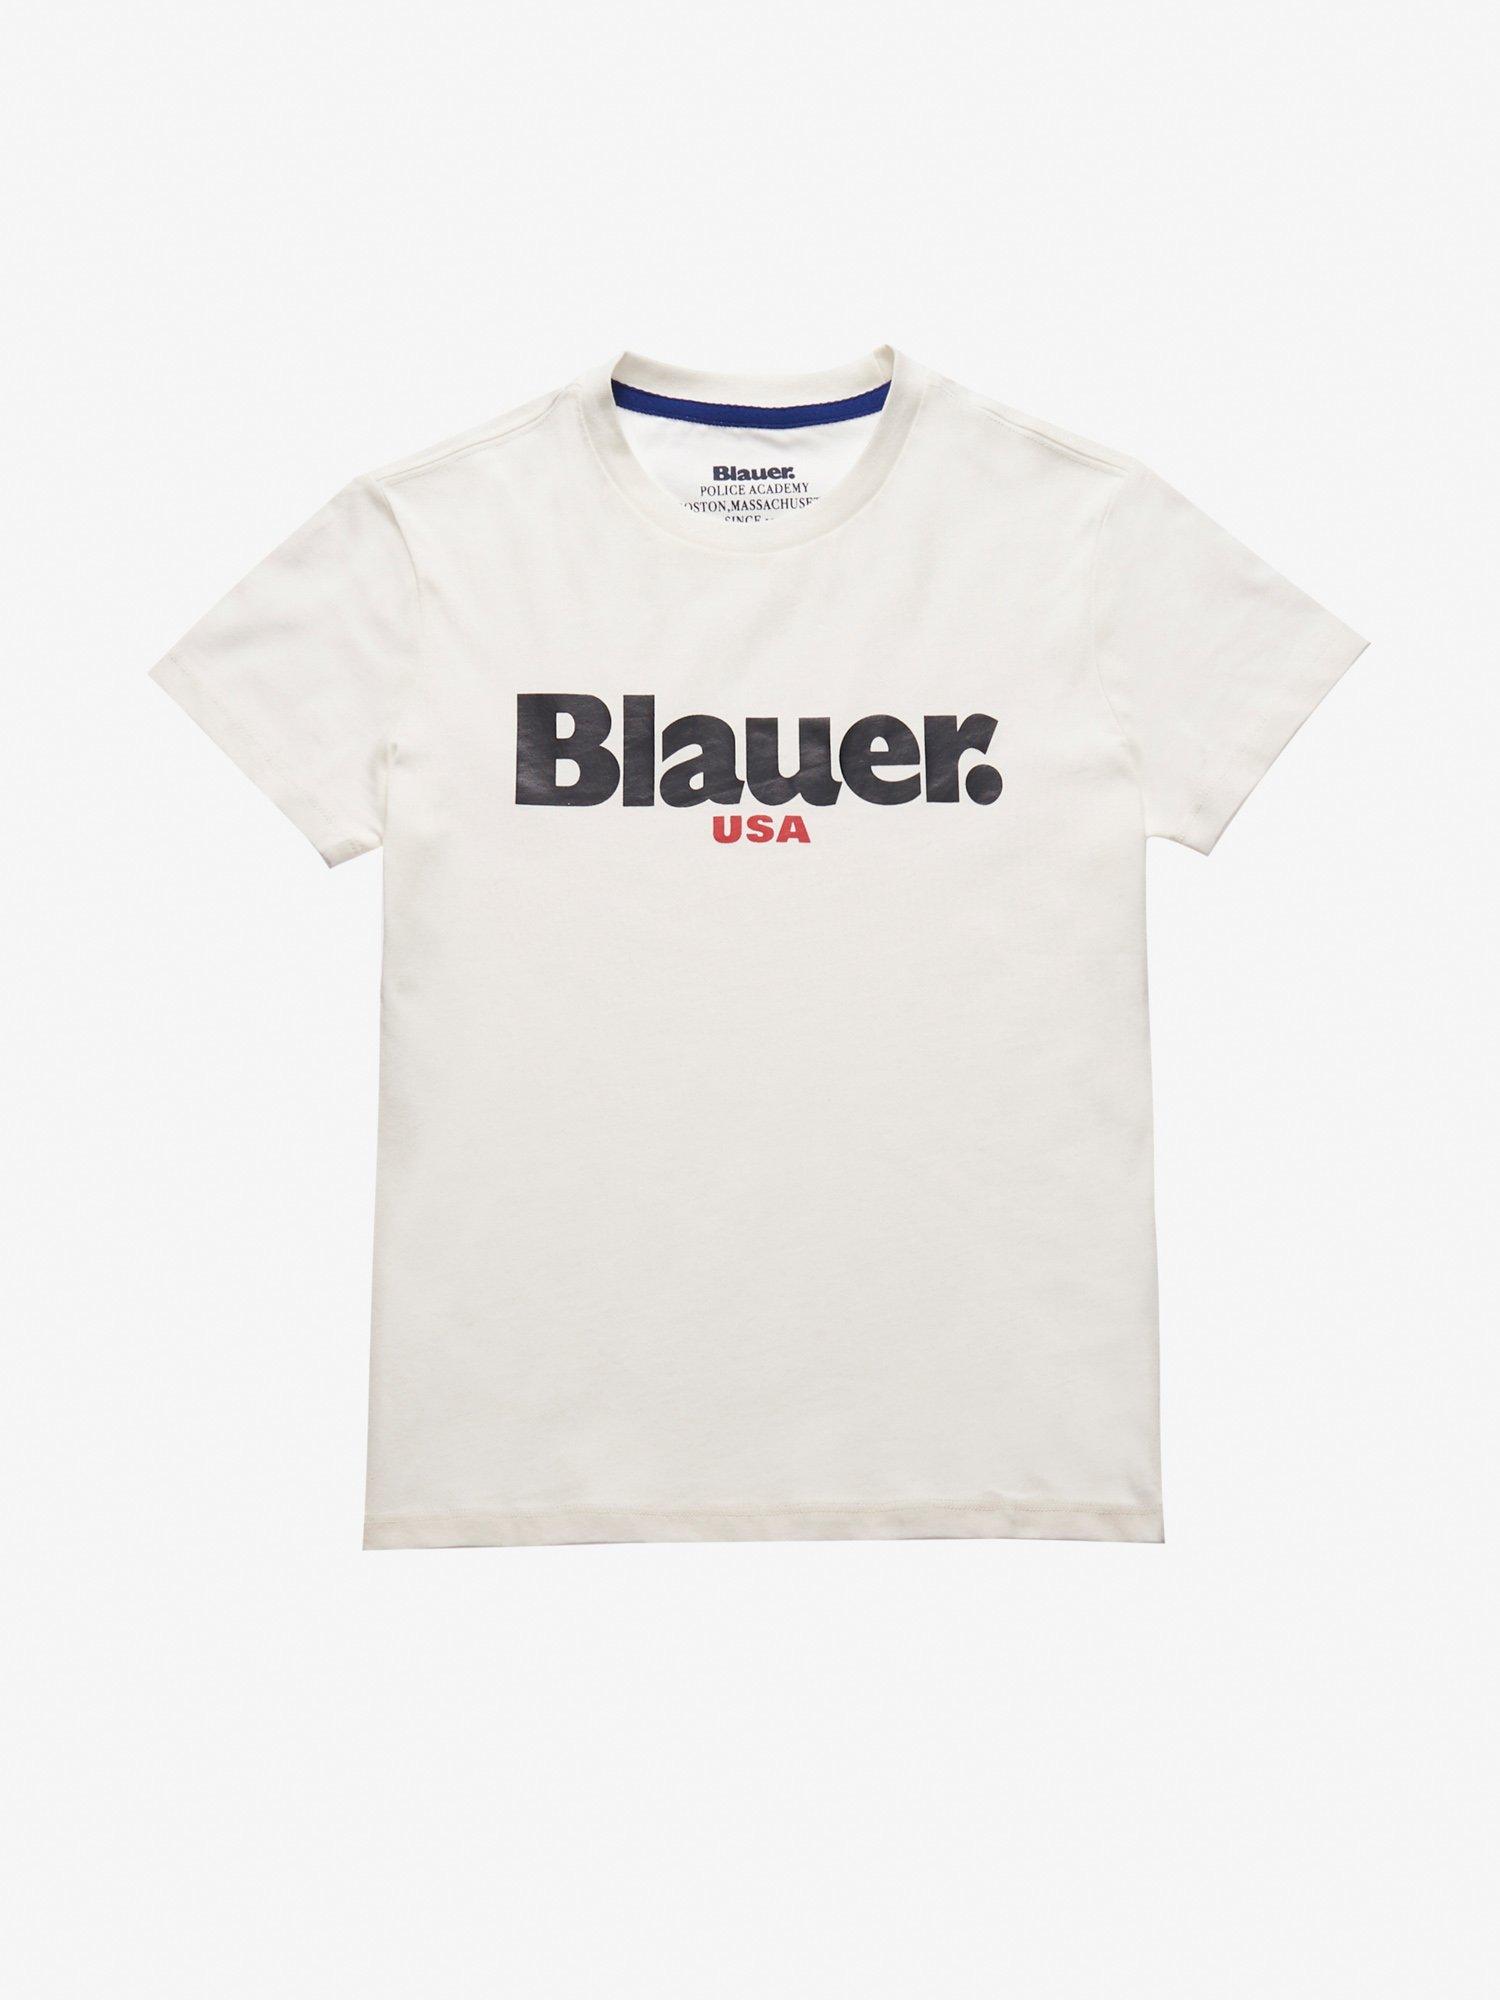 T-SHIRT JUNIOR BLAUER USA - Blauer